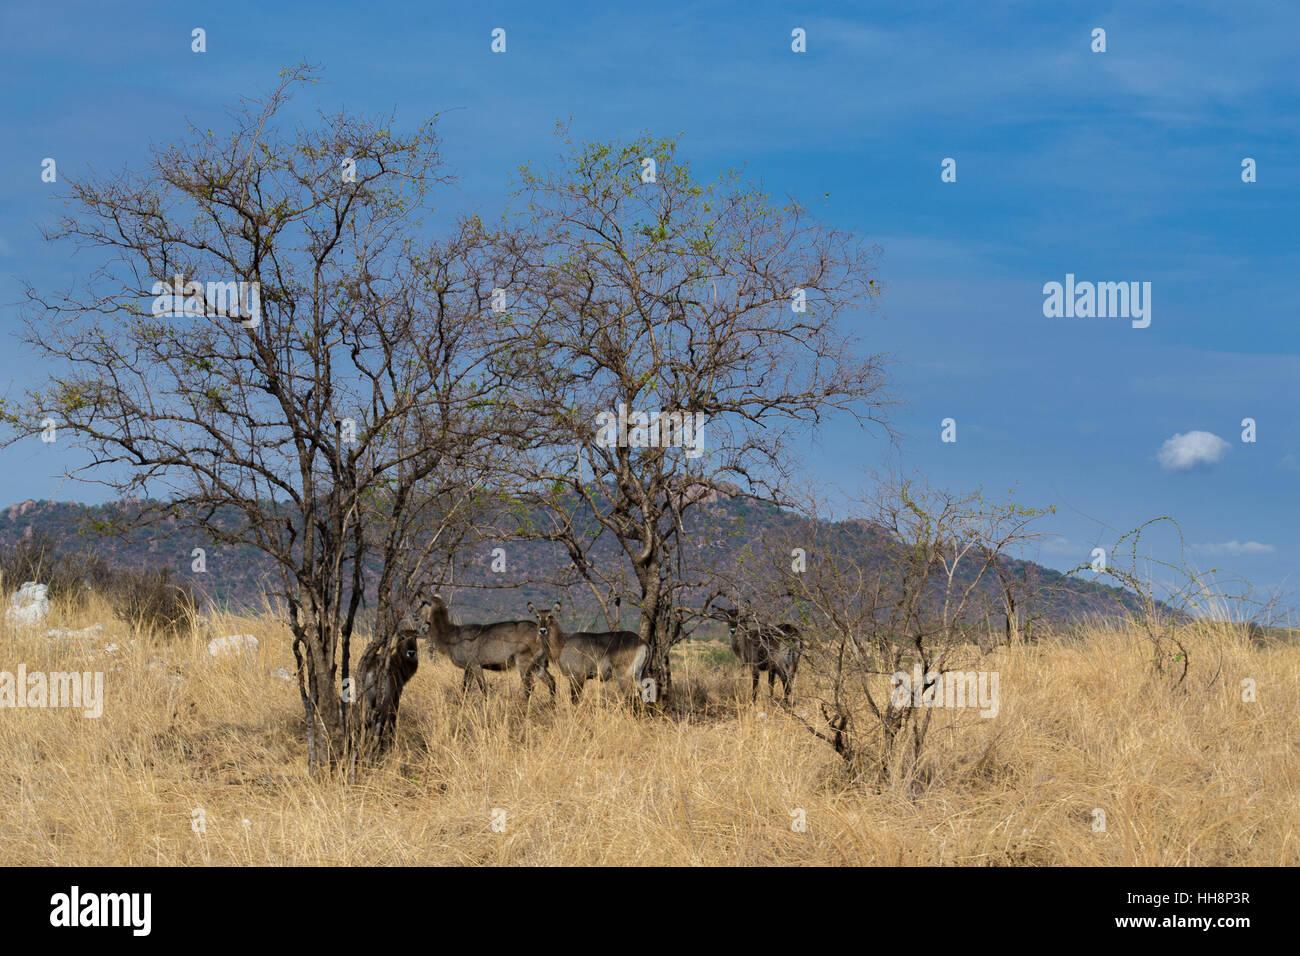 Africa wildlife, live free on national parks, safari - Stock Image